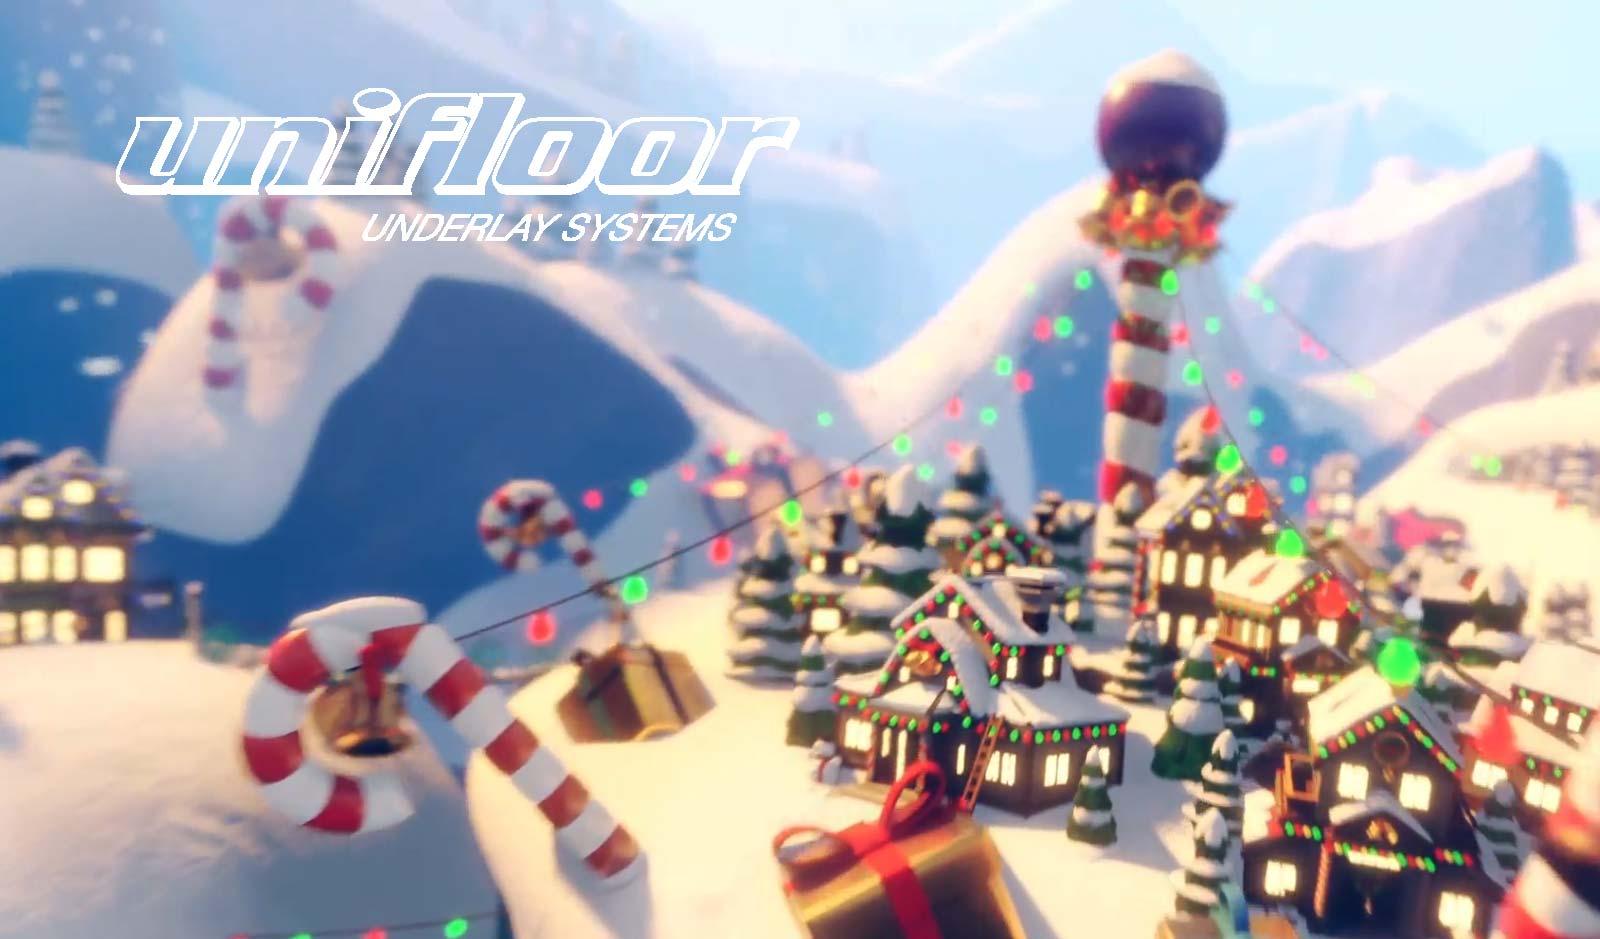 Santa's Workshop / 3D Animatie